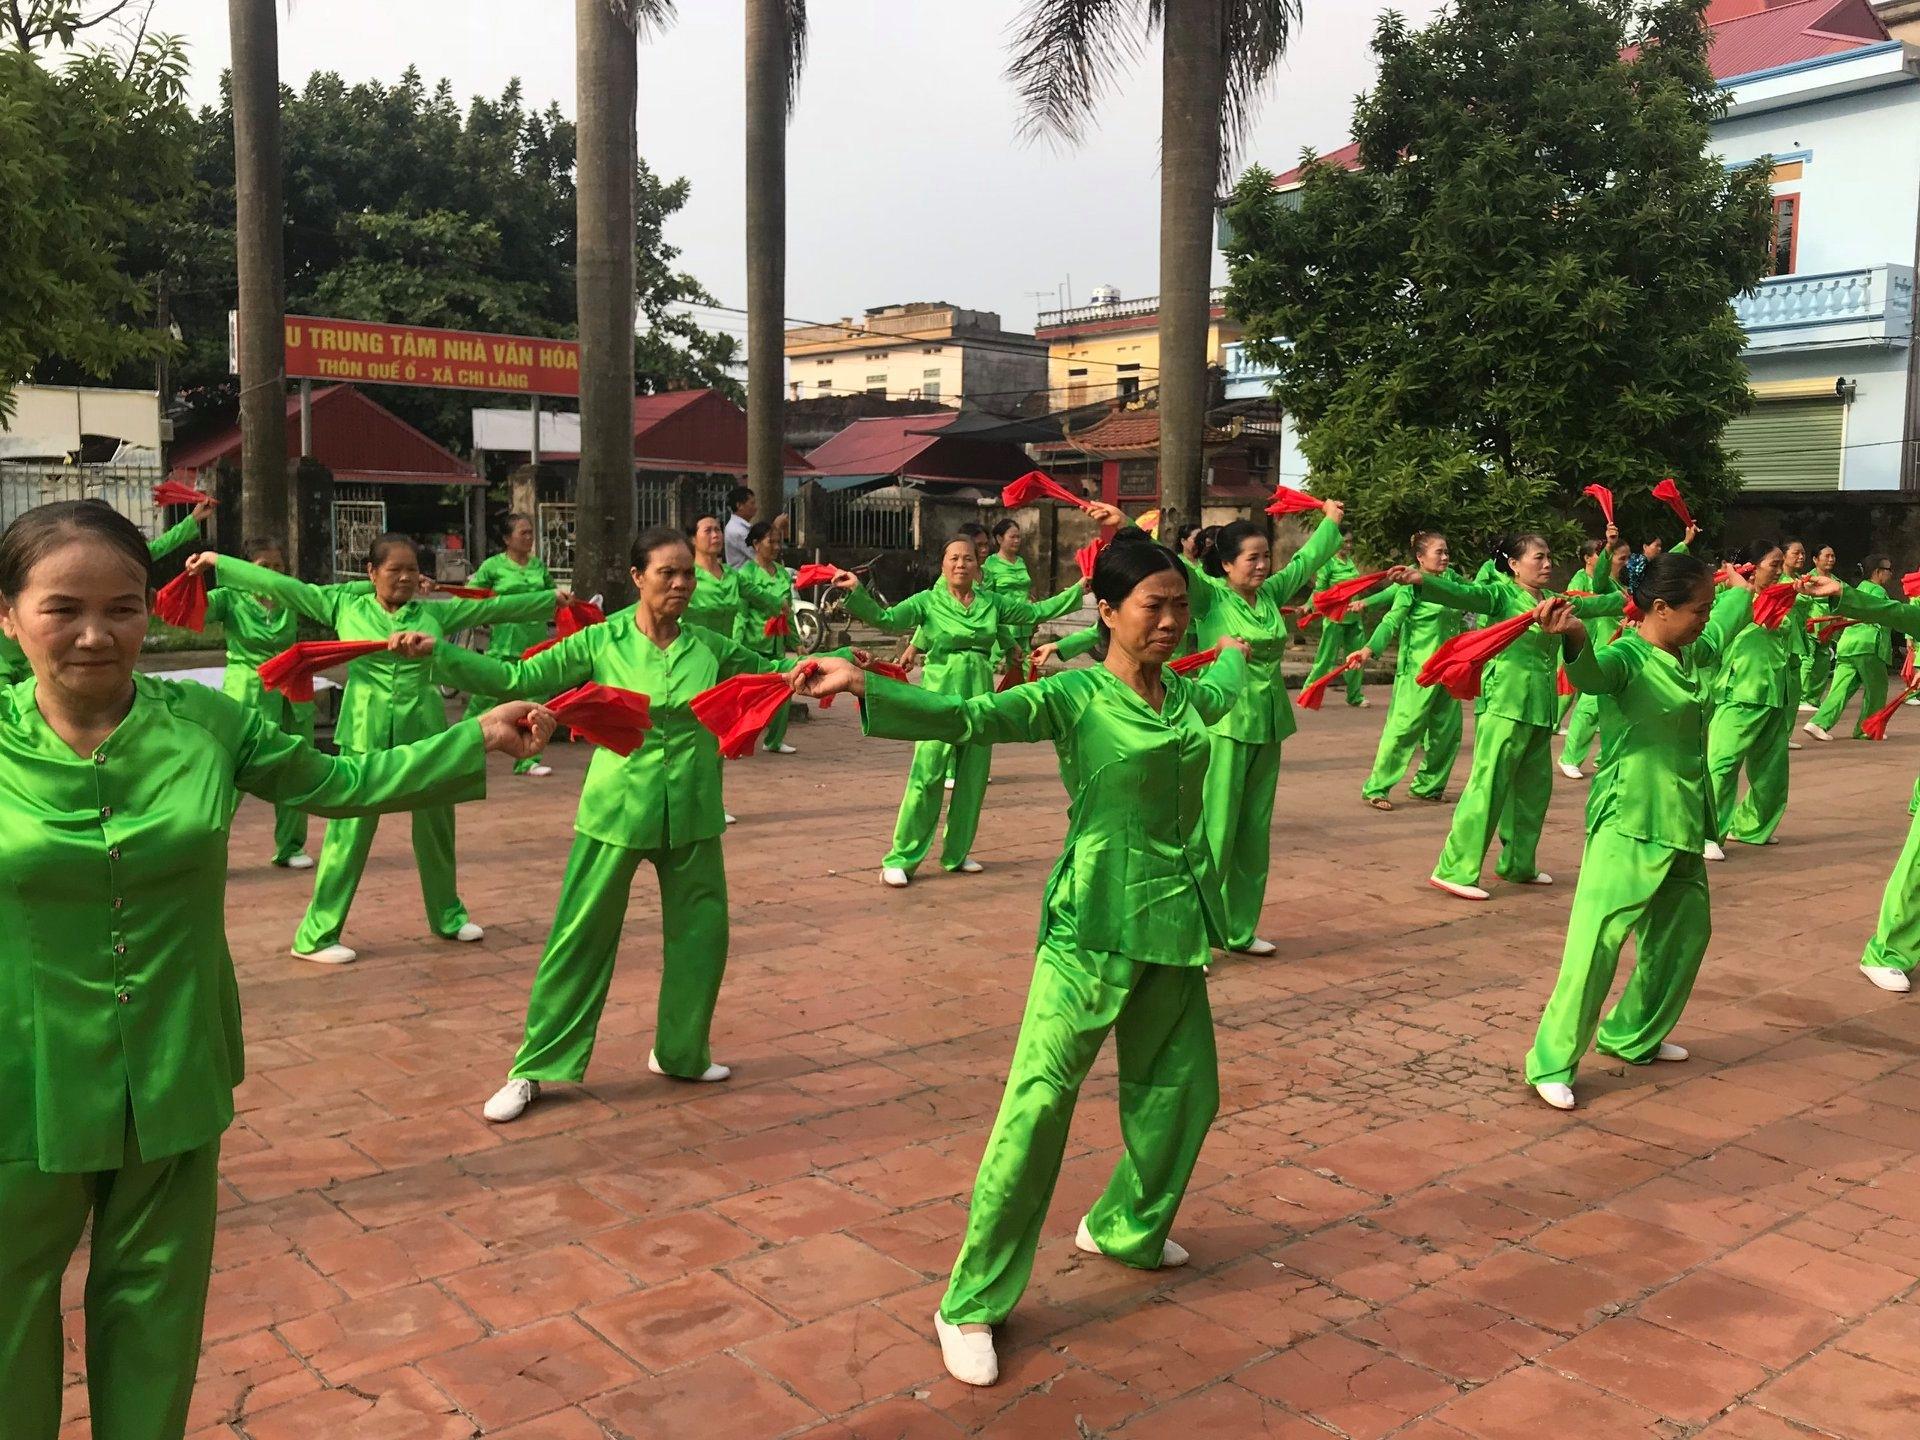 self helping intergenerational club model in vietnam became 2020 hapi grand prize winner